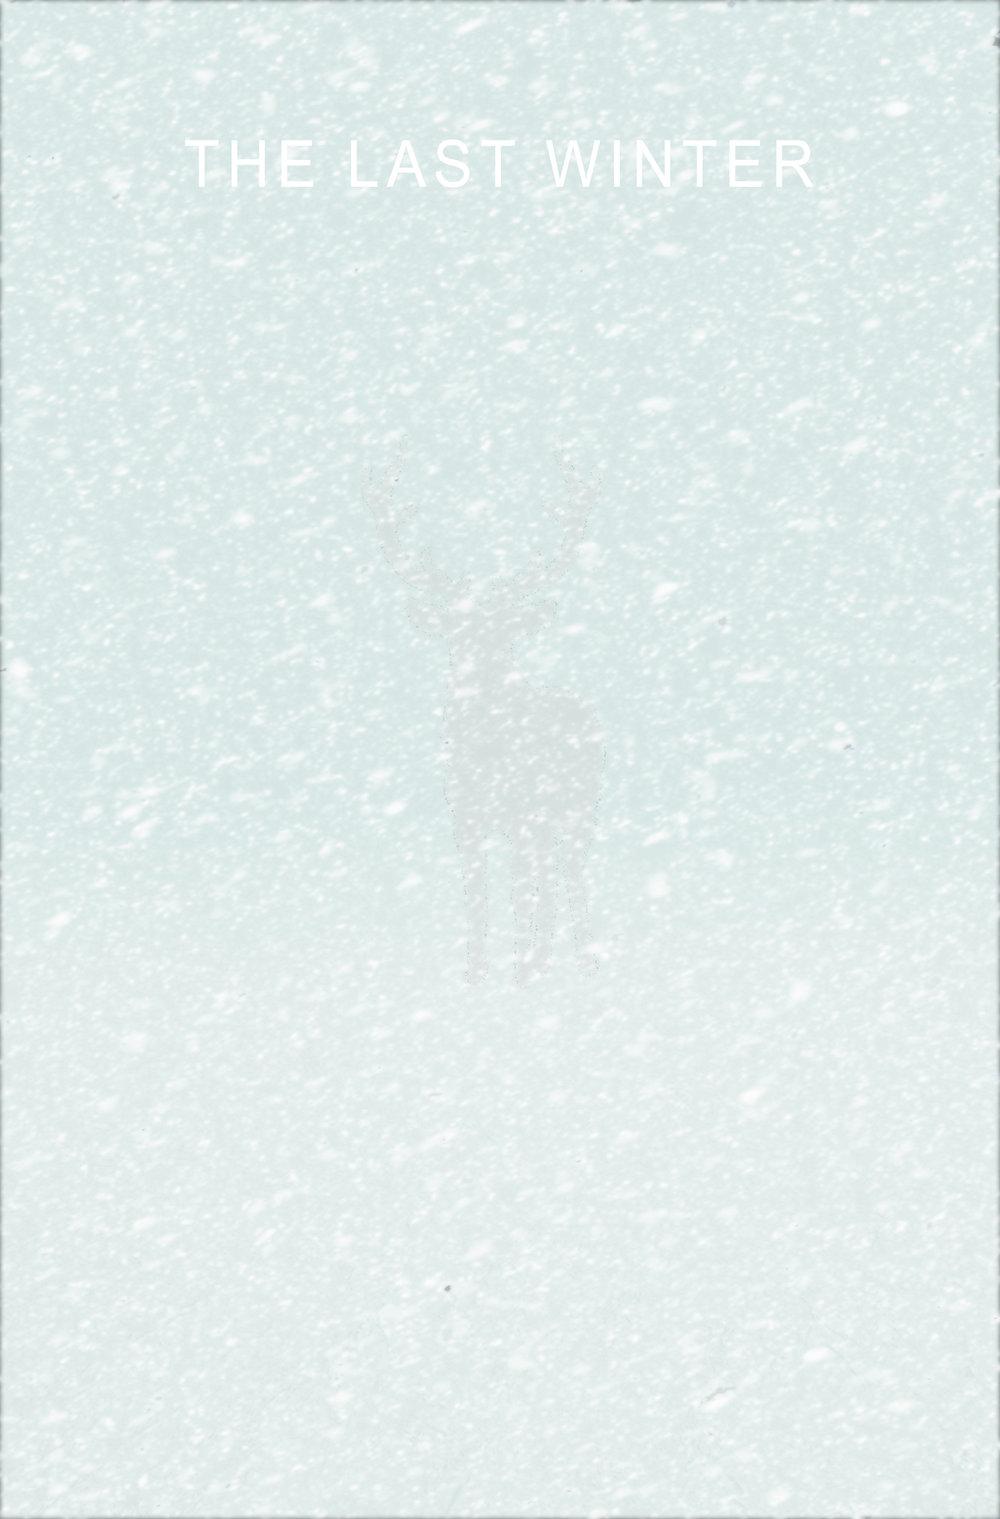 last winter movie poster.jpg